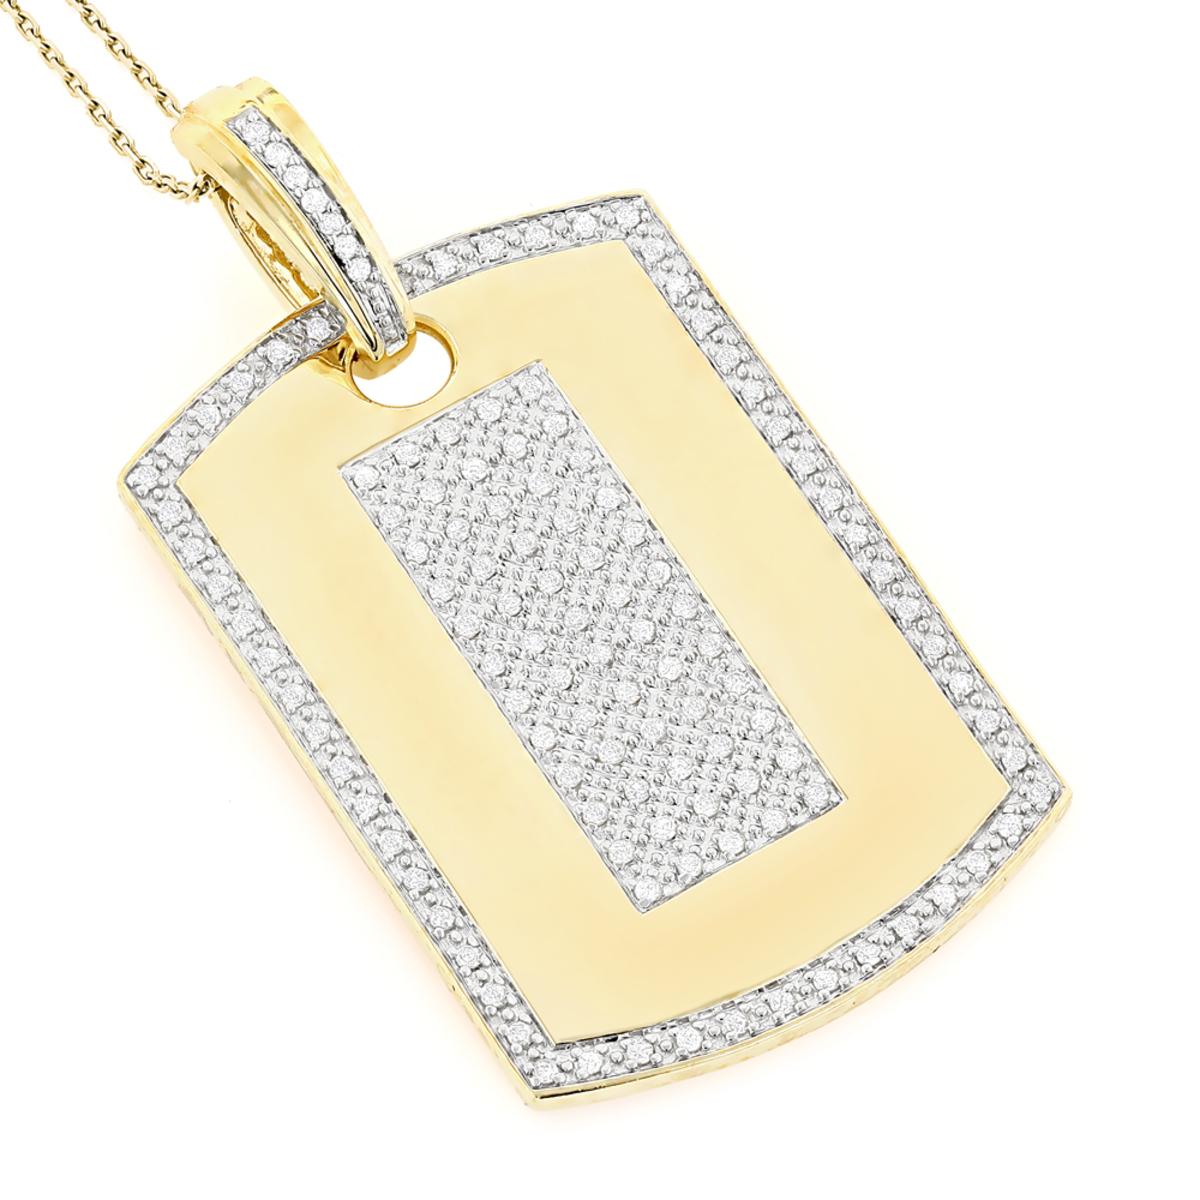 14K Gold Diamond Dog Tag Military Pendant 1.95ct